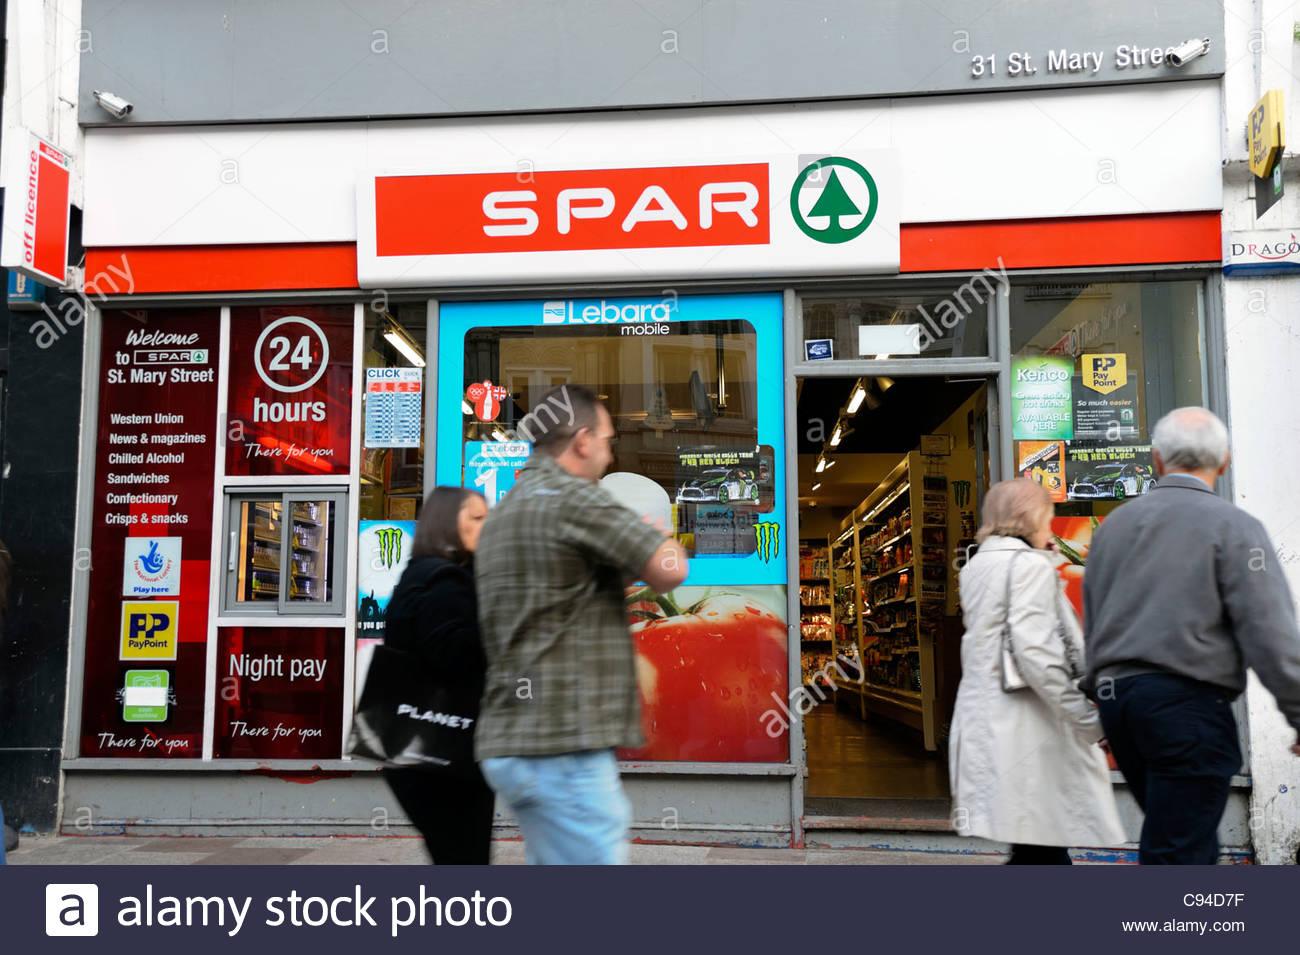 b19051872d Spar Store Uk Stock Photos   Spar Store Uk Stock Images - Alamy